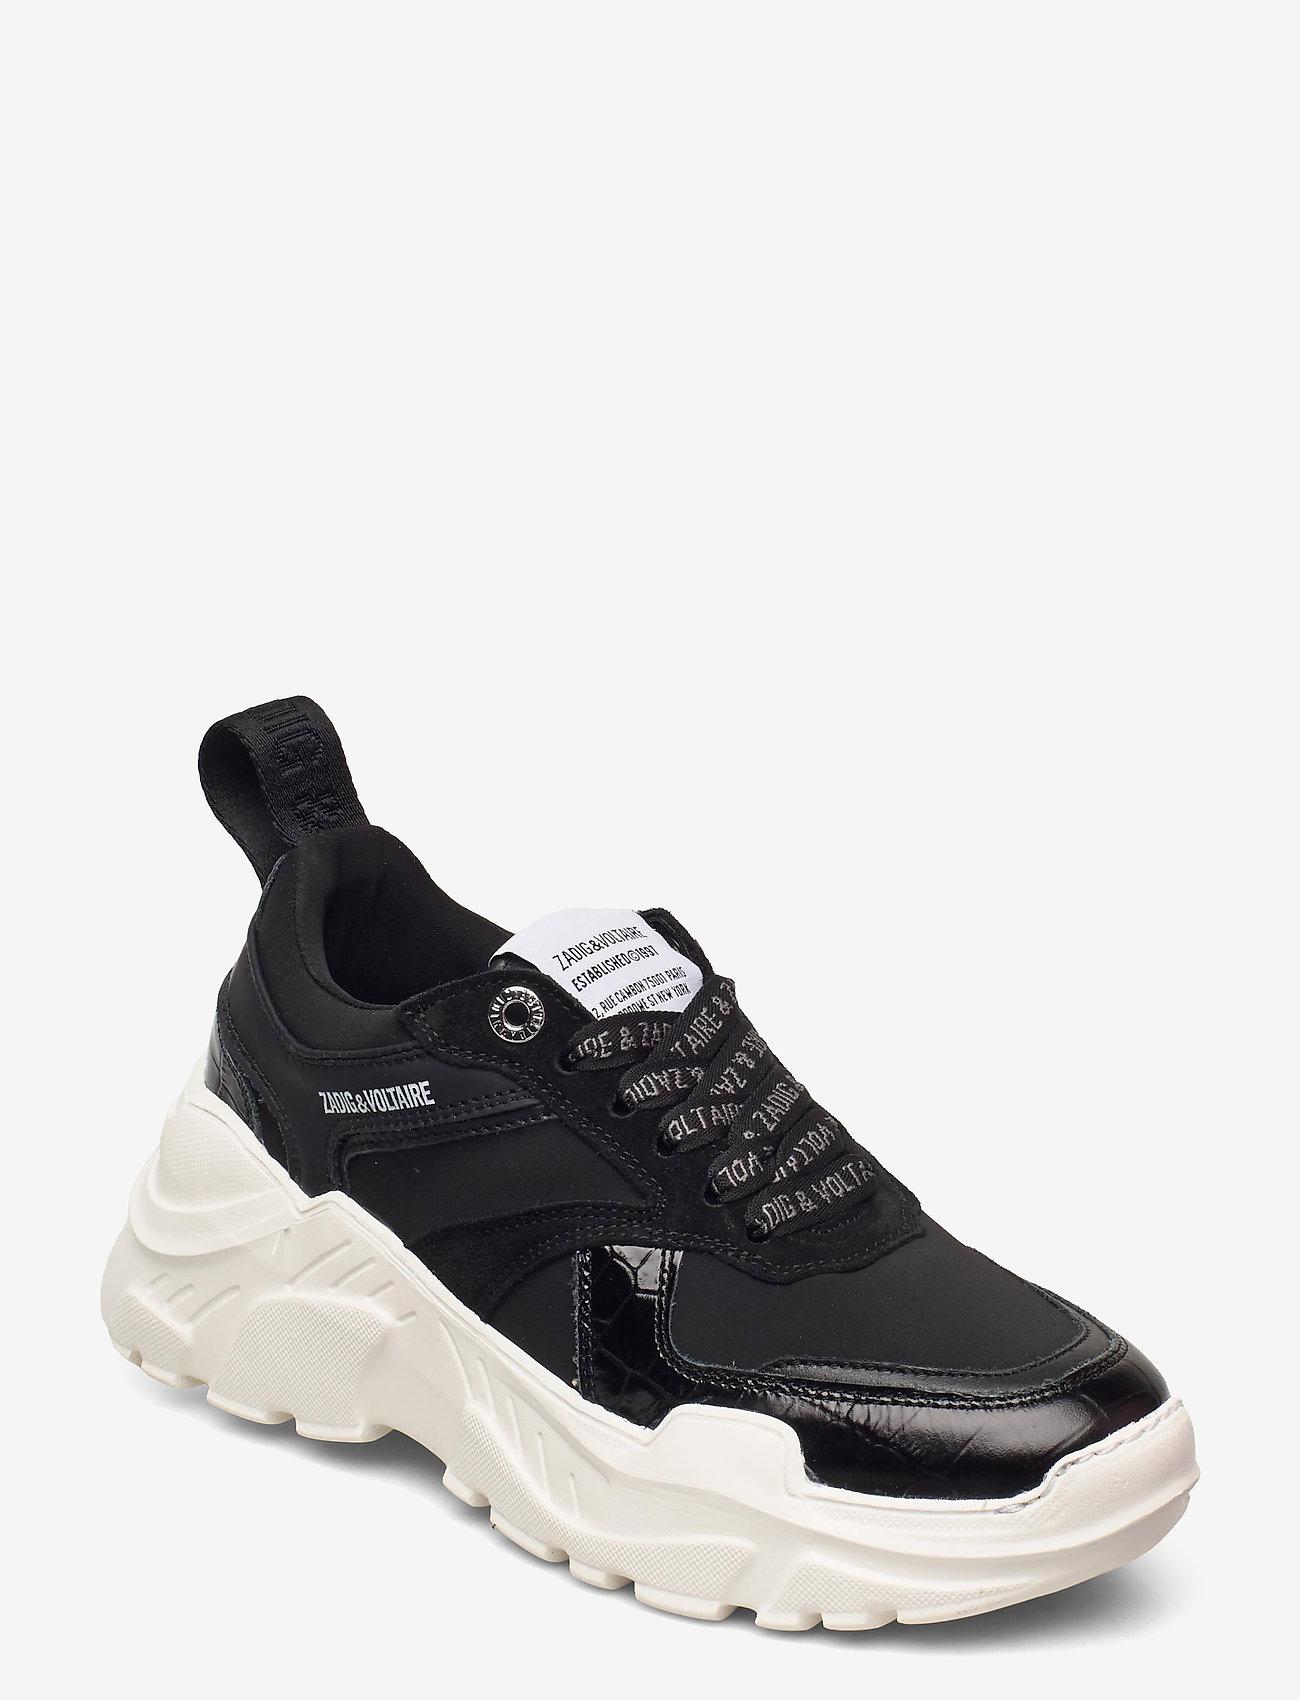 Zadig & Voltaire - FUTURE EMBOSSED CROCO + MIX NEOPRENE - chunky sneakers - black - 0